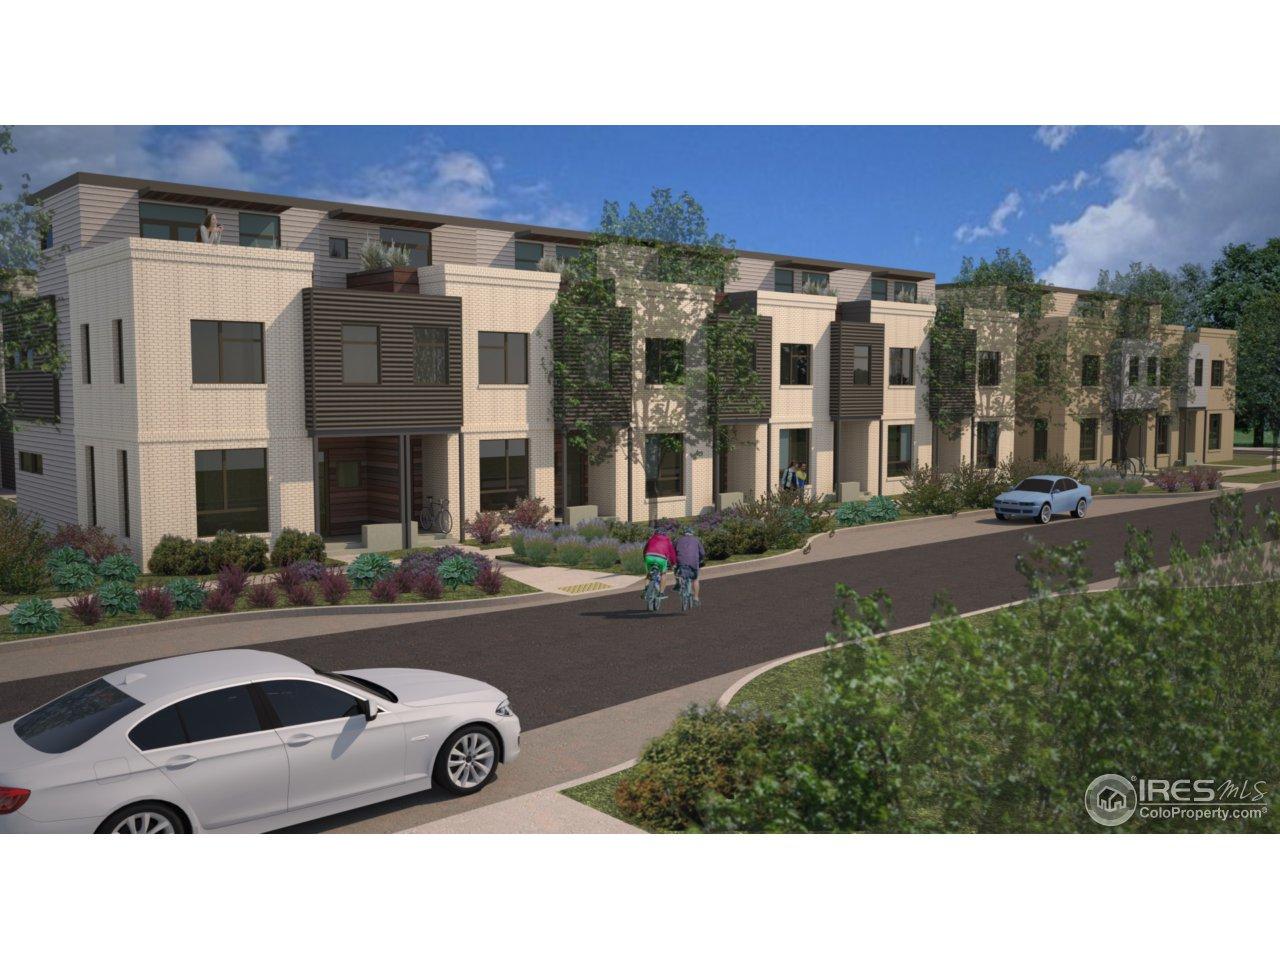 3115 Bluff St, Boulder CO 80301